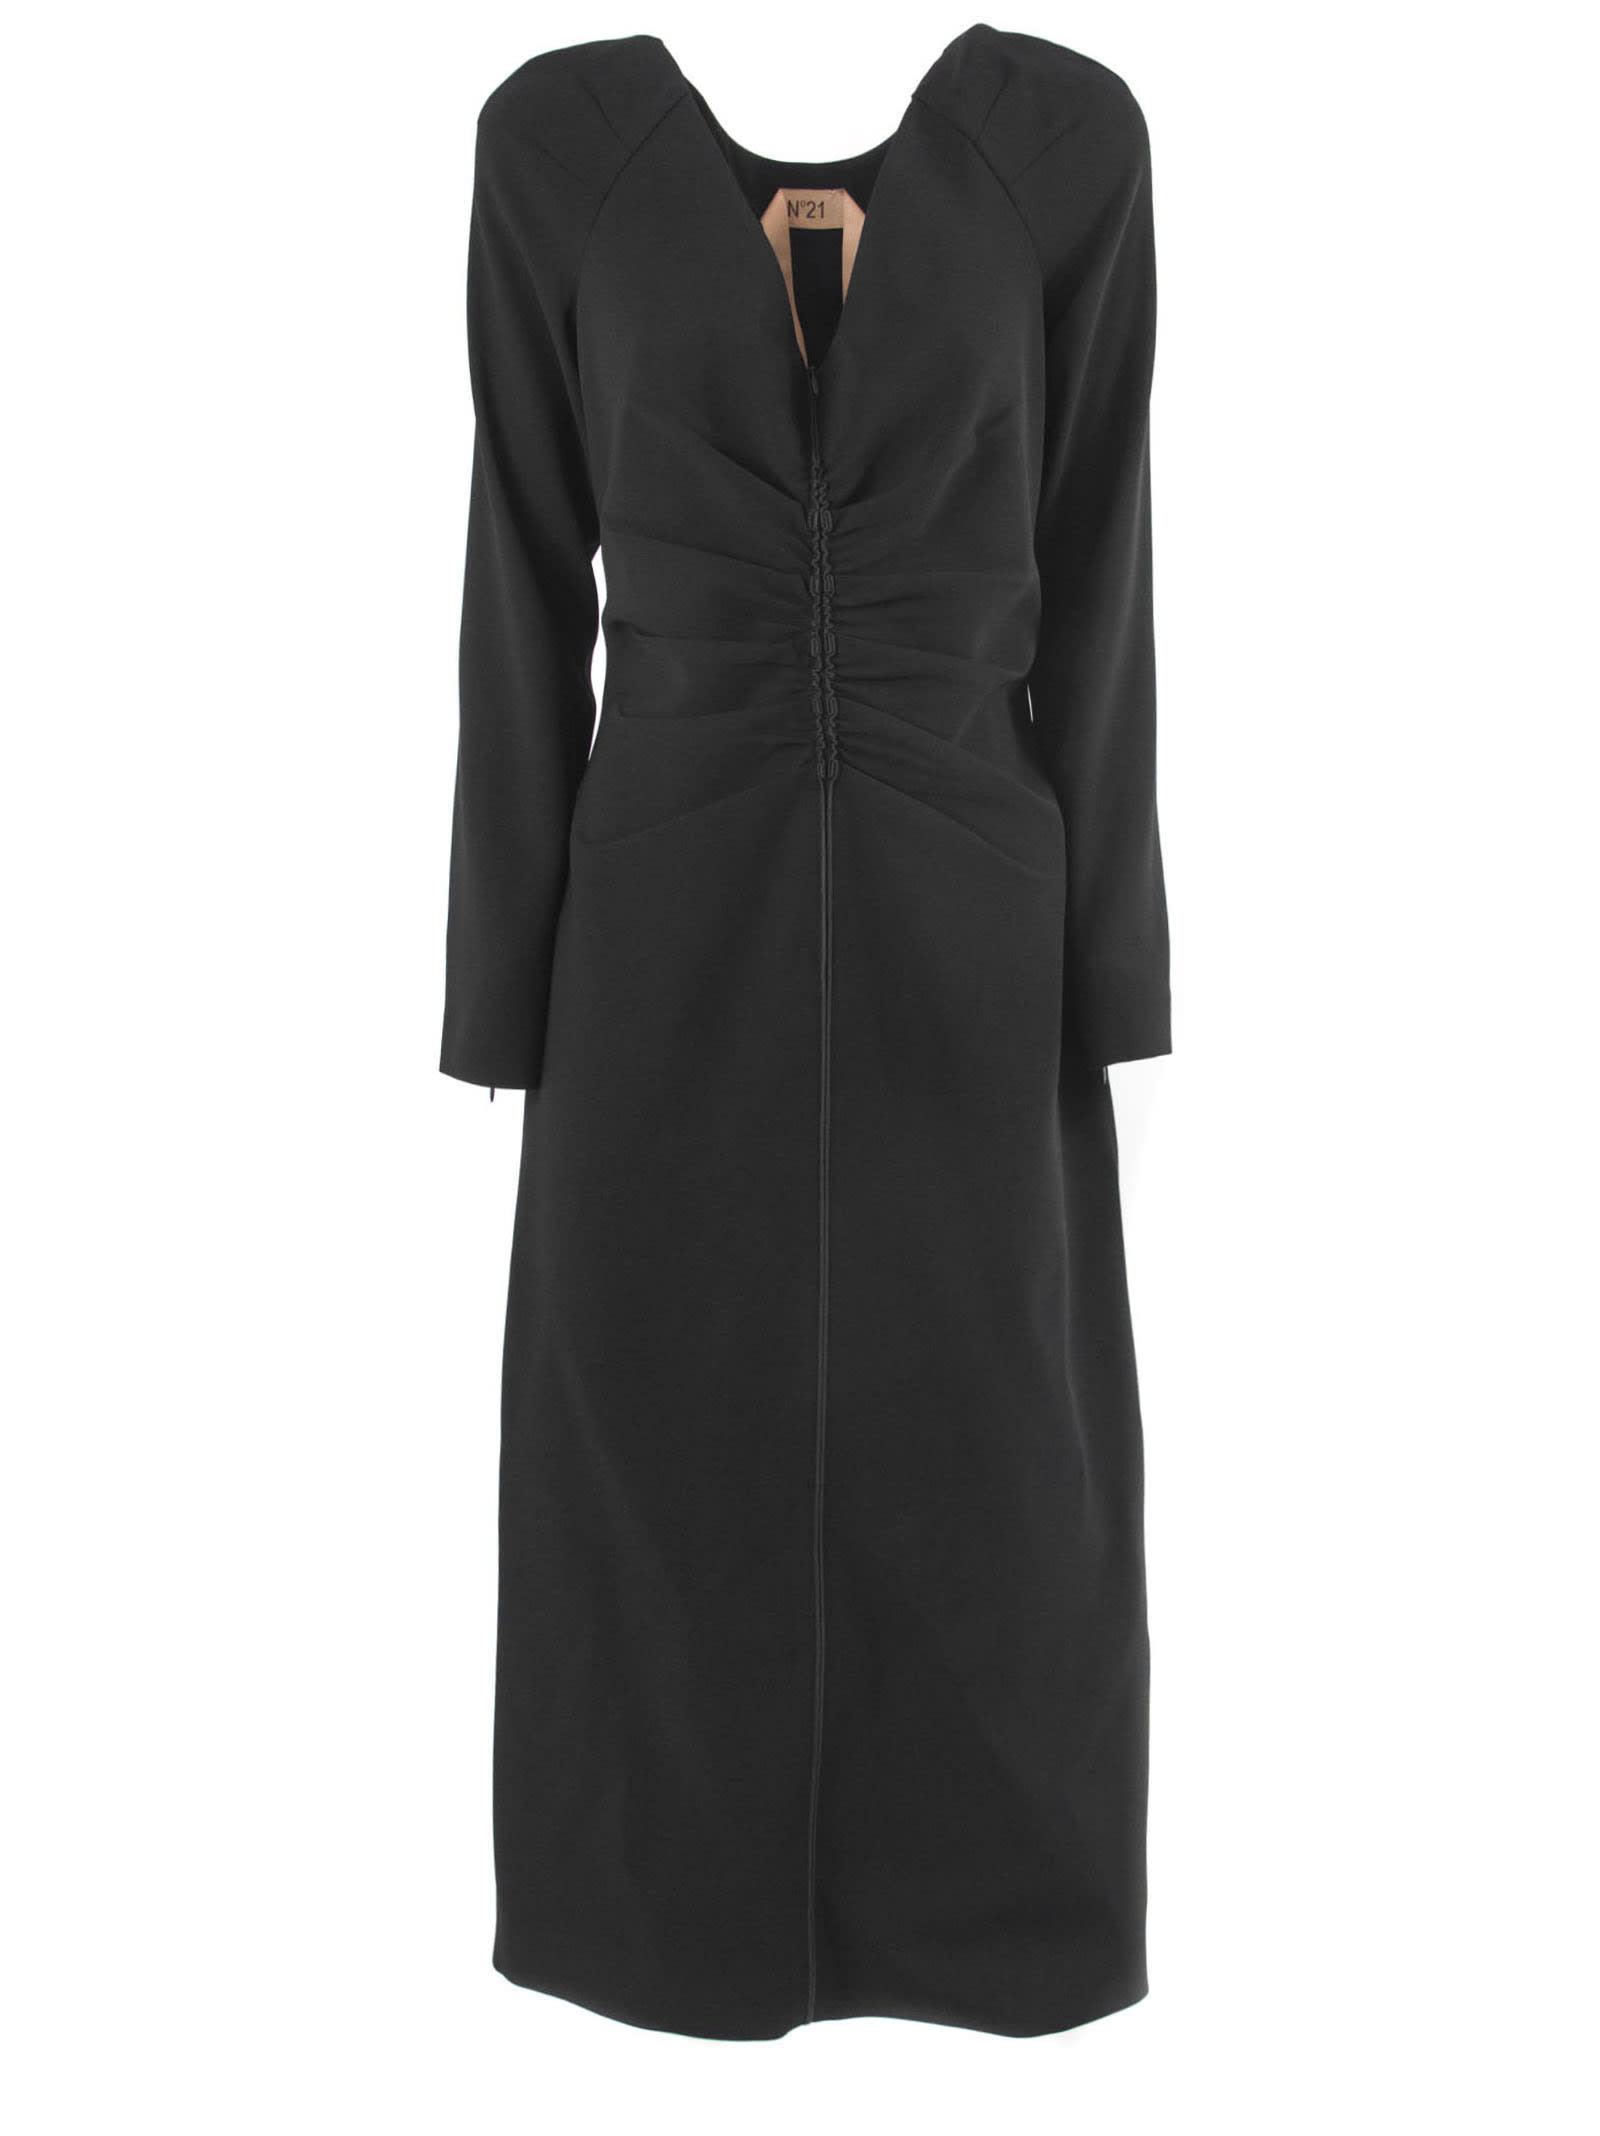 N.21 Long Dress In Black Fabric